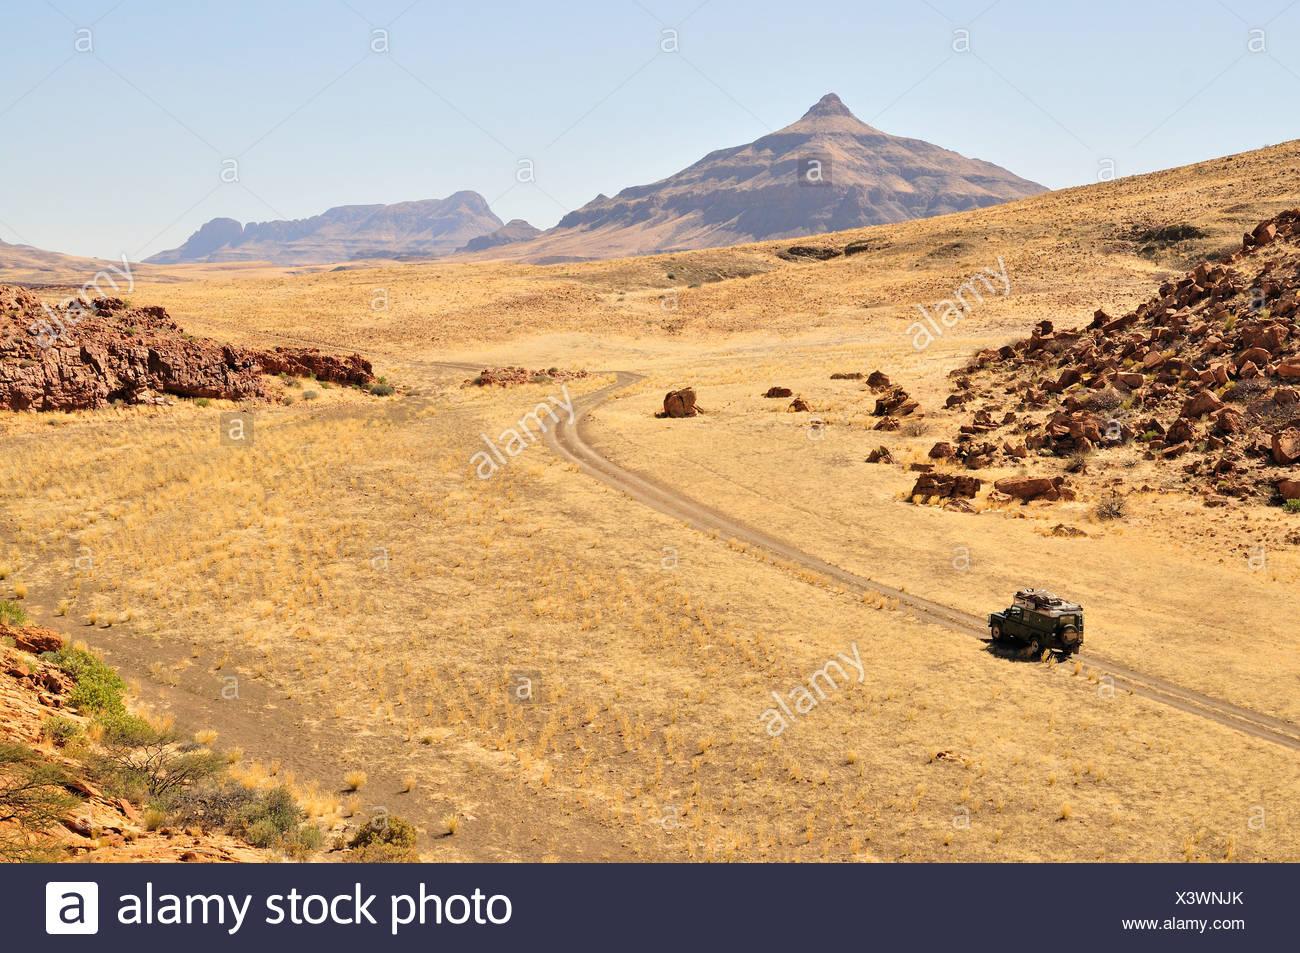 Safari vehicle in the Mik mountains, Damaraland, Namibia, Africa - Stock Image